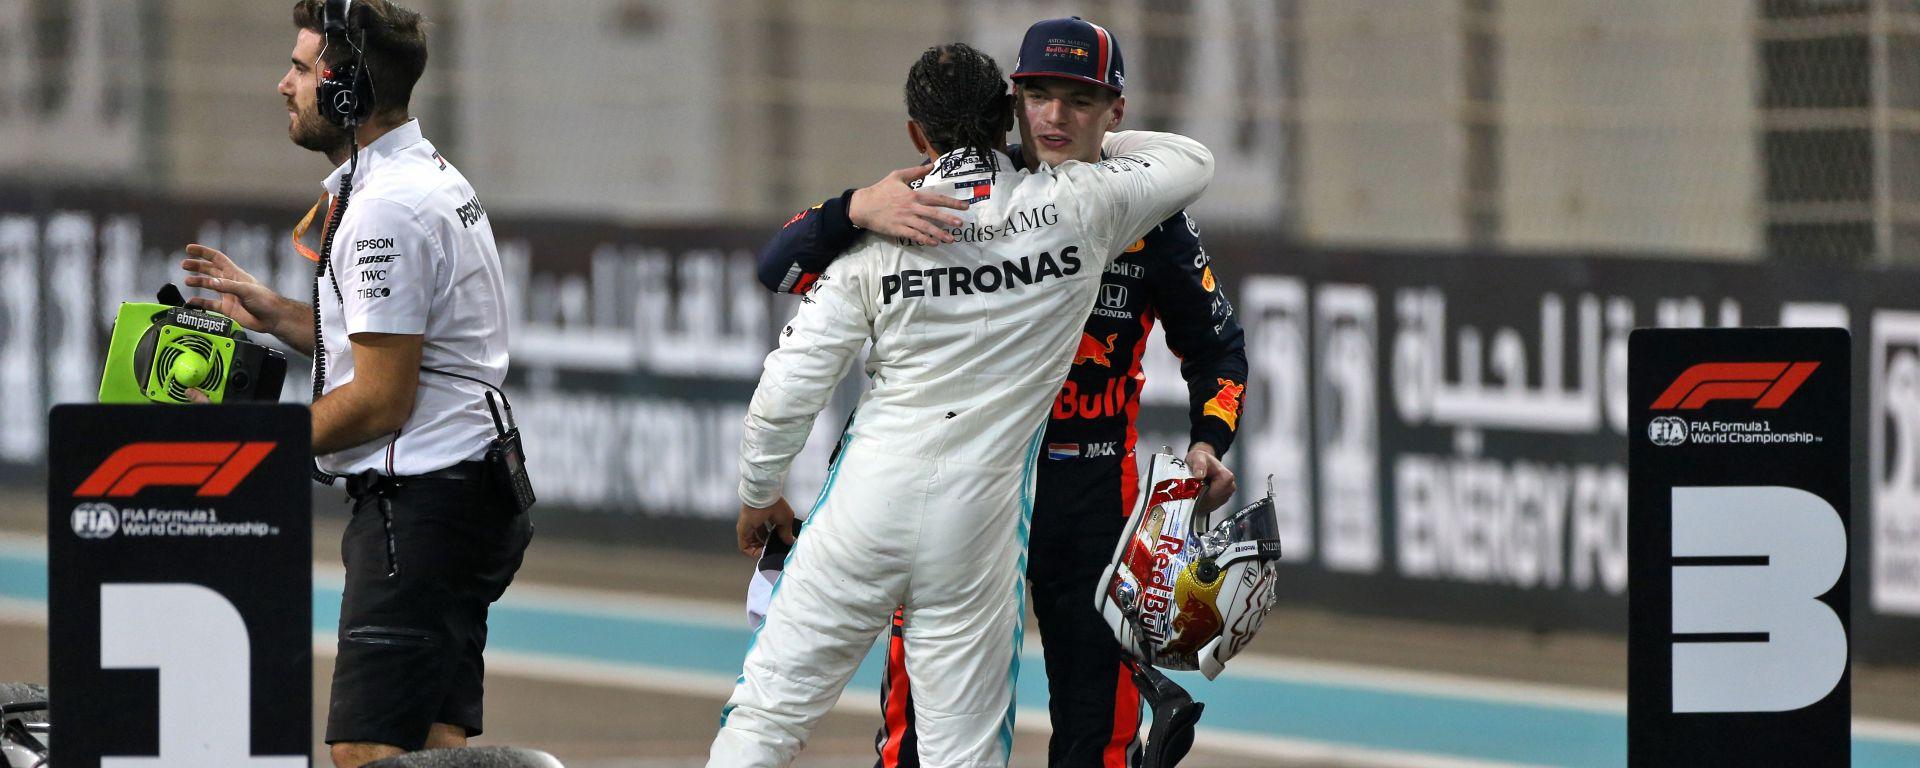 F1 GP Abu Dhabi 2019, Yas Marina: Max Verstappen (Red Bull) e Lewis Hamilton (Mercedes)